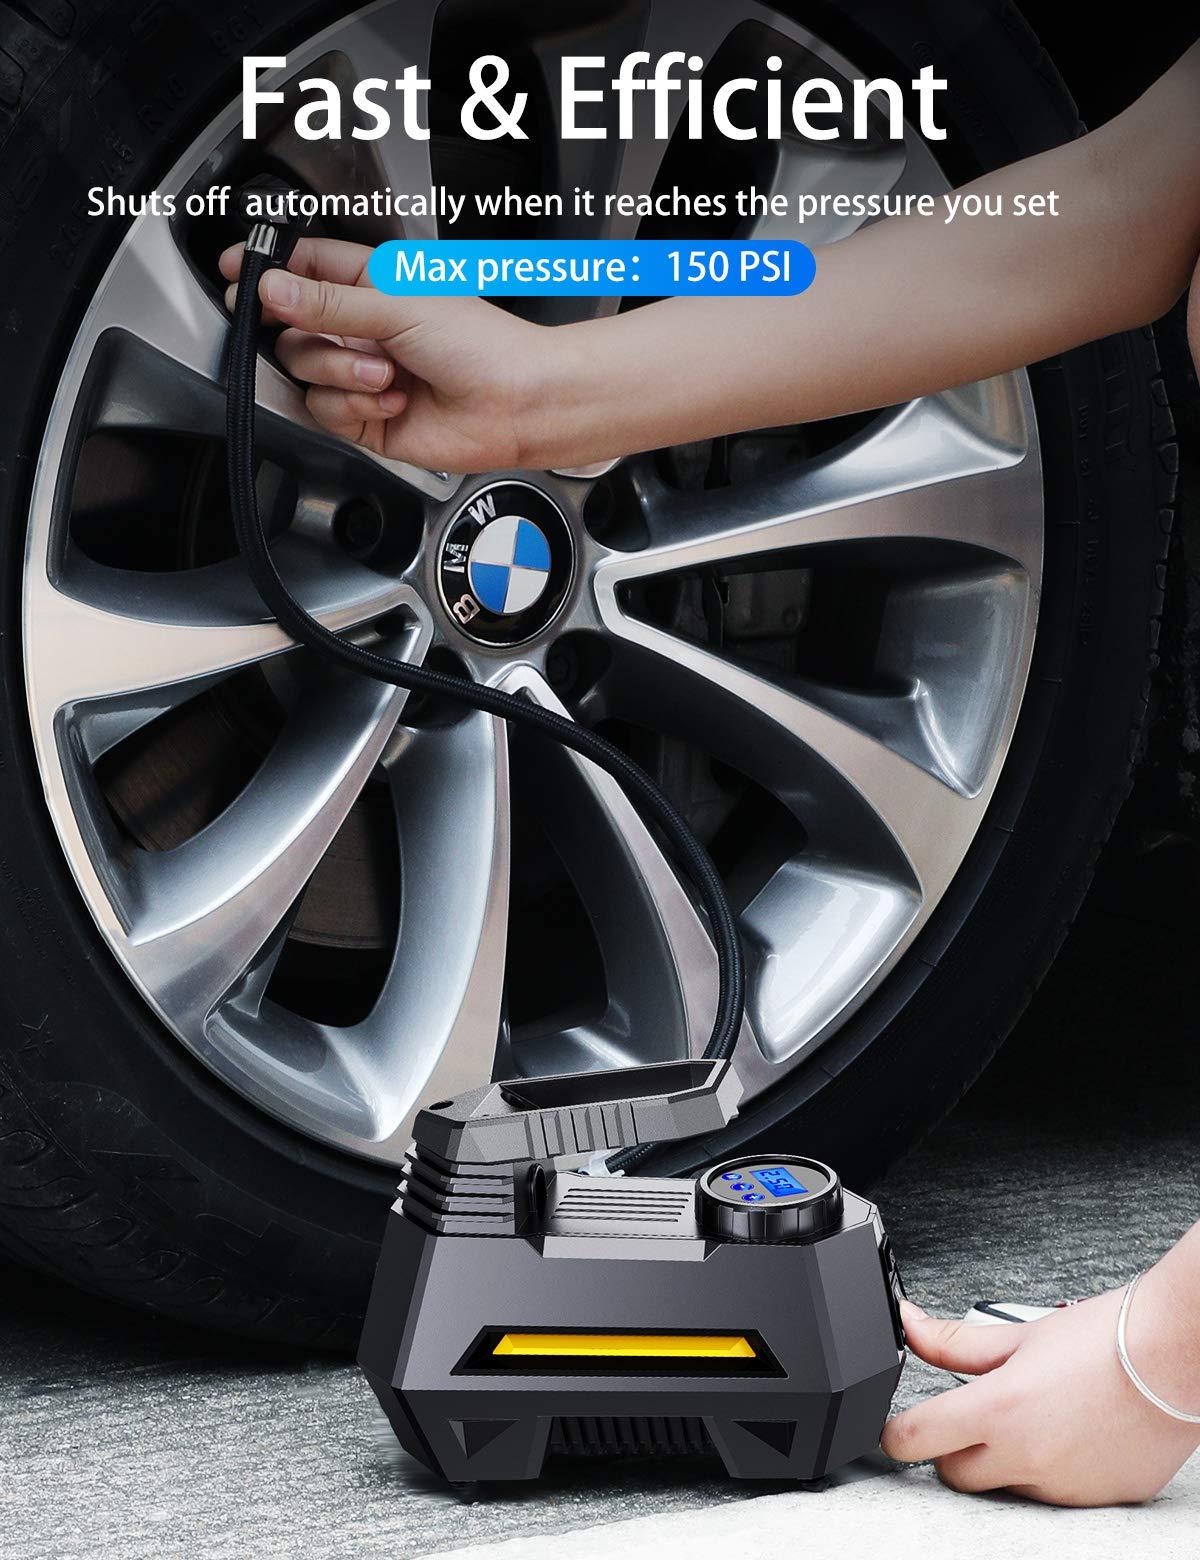 JOYROOM Portable Air Compressor Tire Inflator - Car Tire Pump with Digital Pressure Gauge (150 PSI 12V DC), Bright Emergency Flashlight - for Auto, Trucks, Bicycles, Balls by JOYROOM (Image #2)